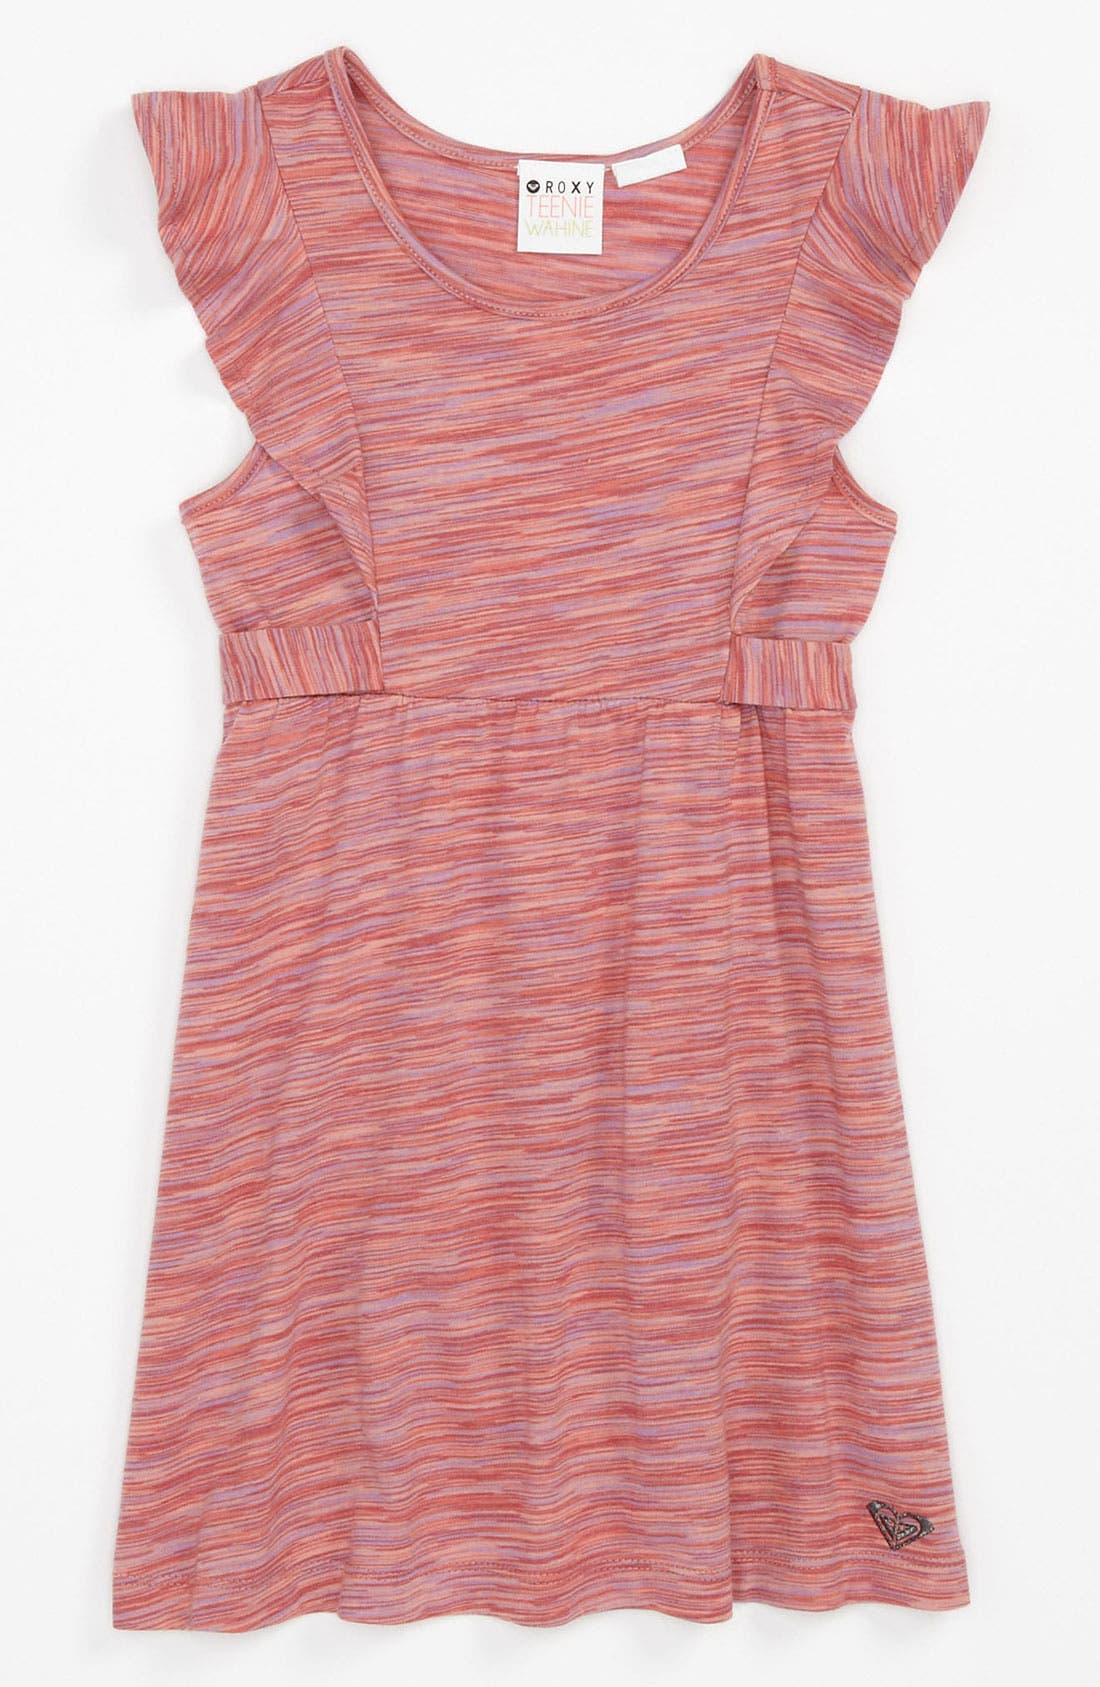 Main Image - 'Frost' Dress (Little Girls)